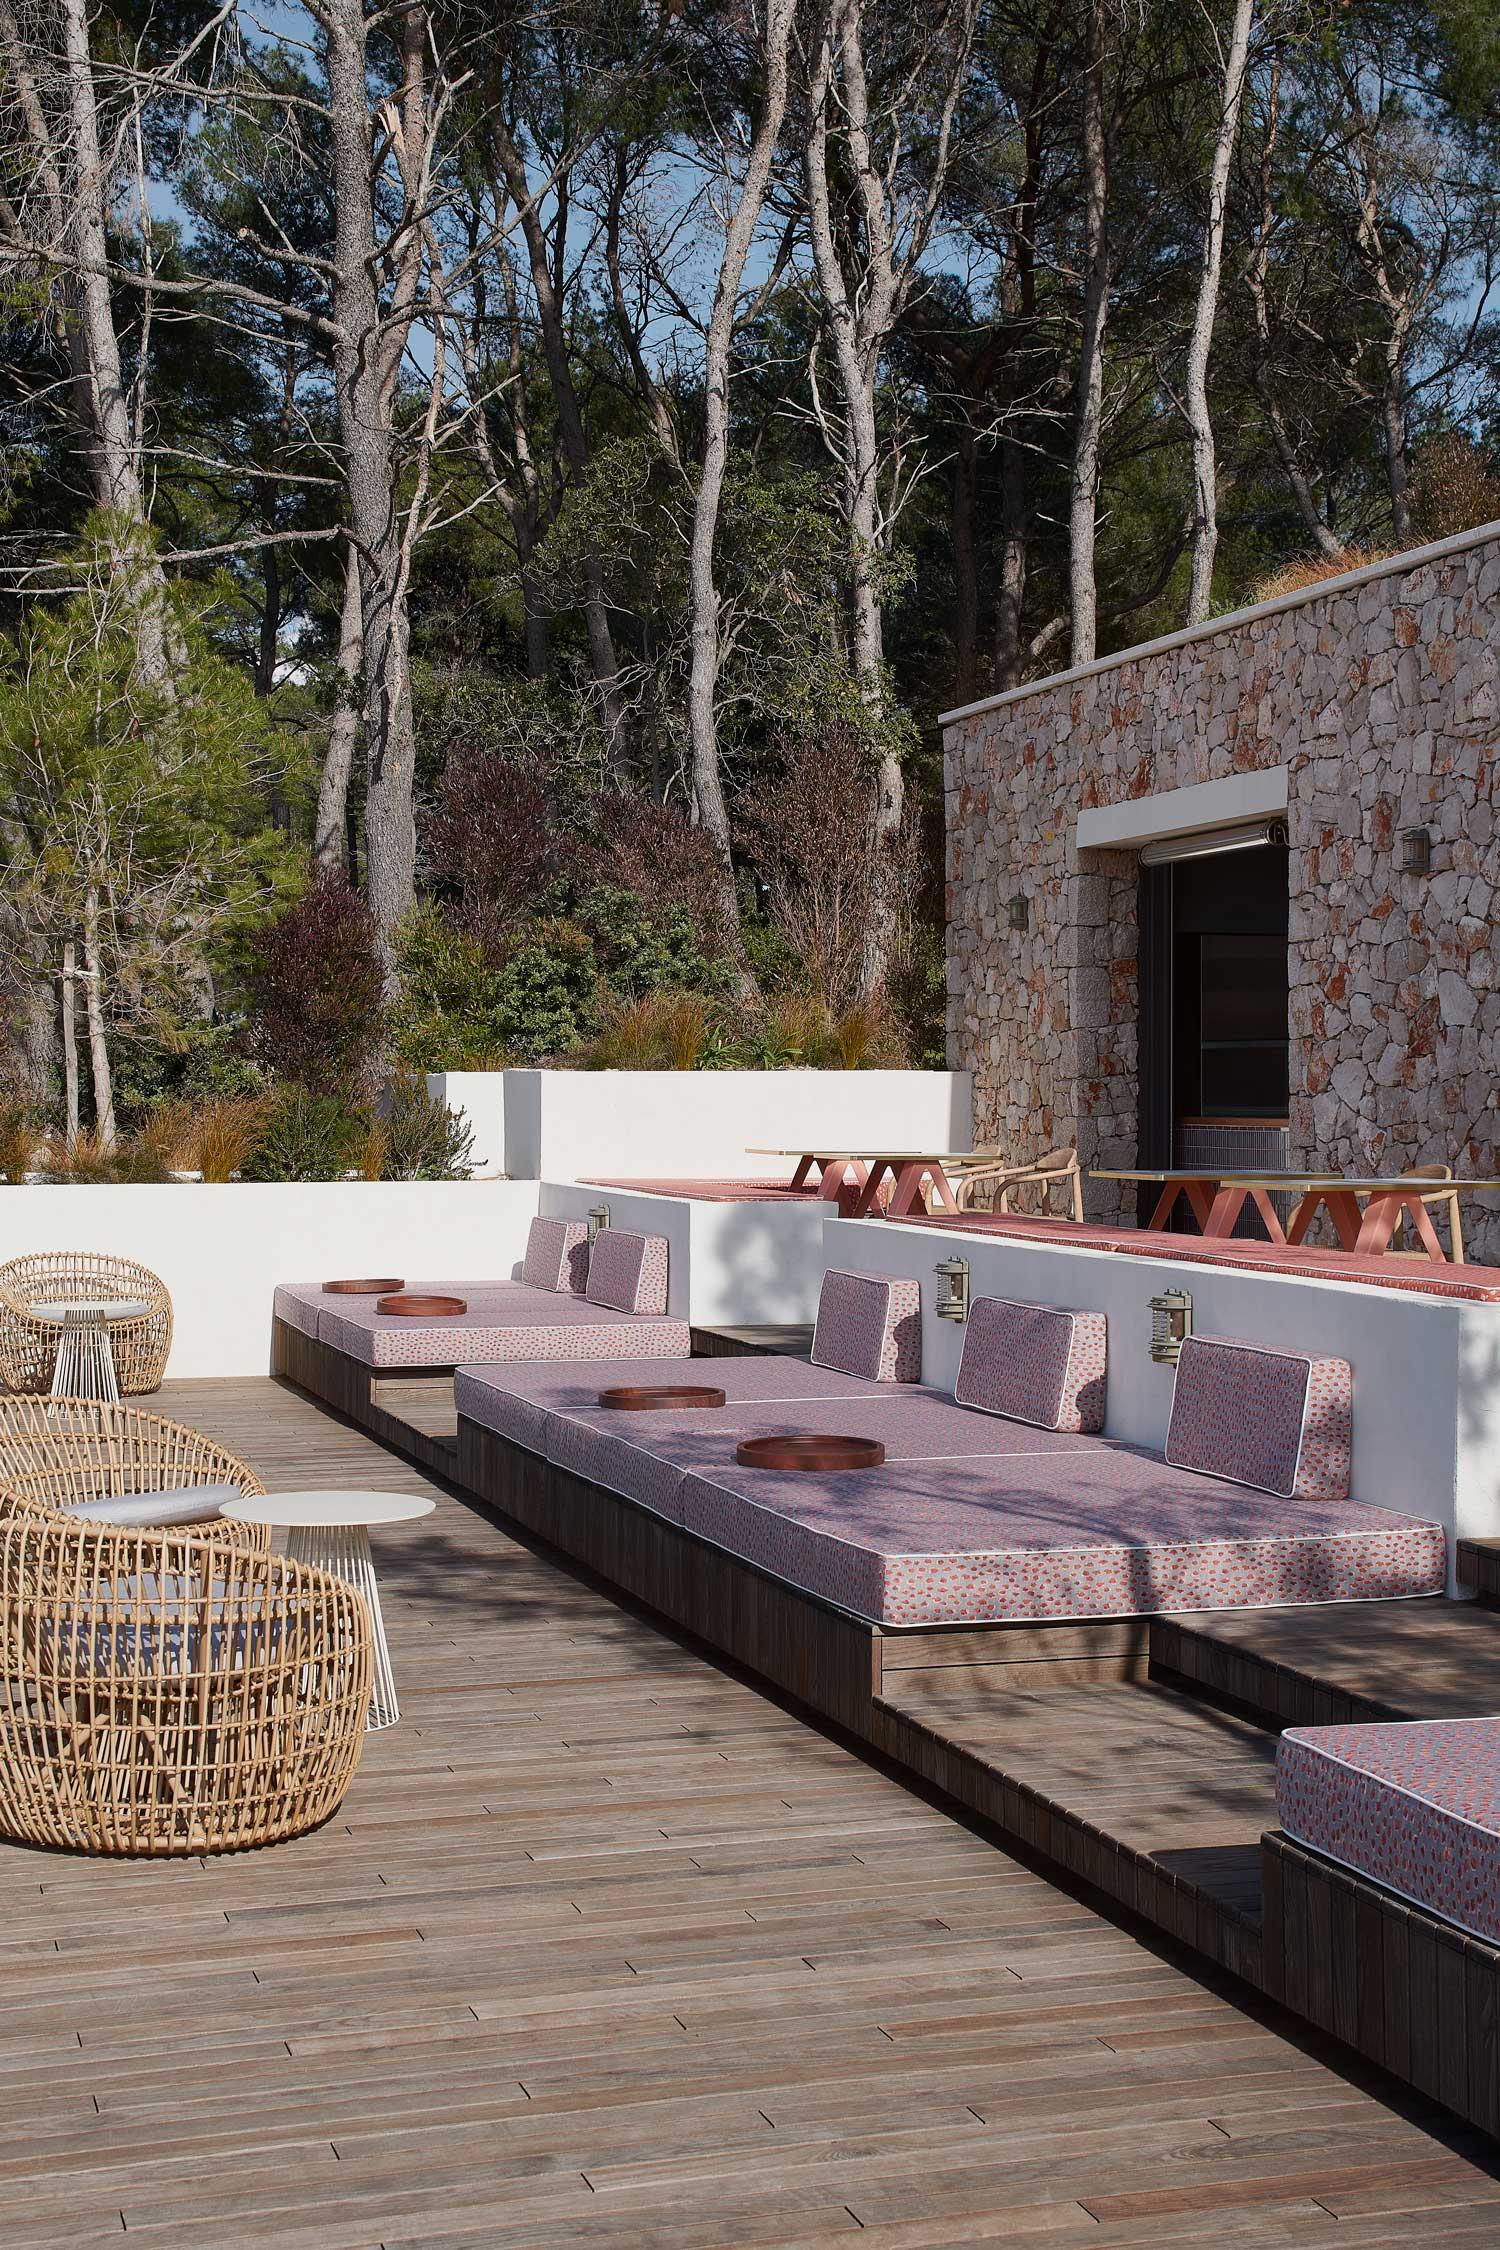 Lam Studio Hotel Maslina Hvar Croatia Luxury Accommodatino Photo Claire Israel Yellowtrace 23